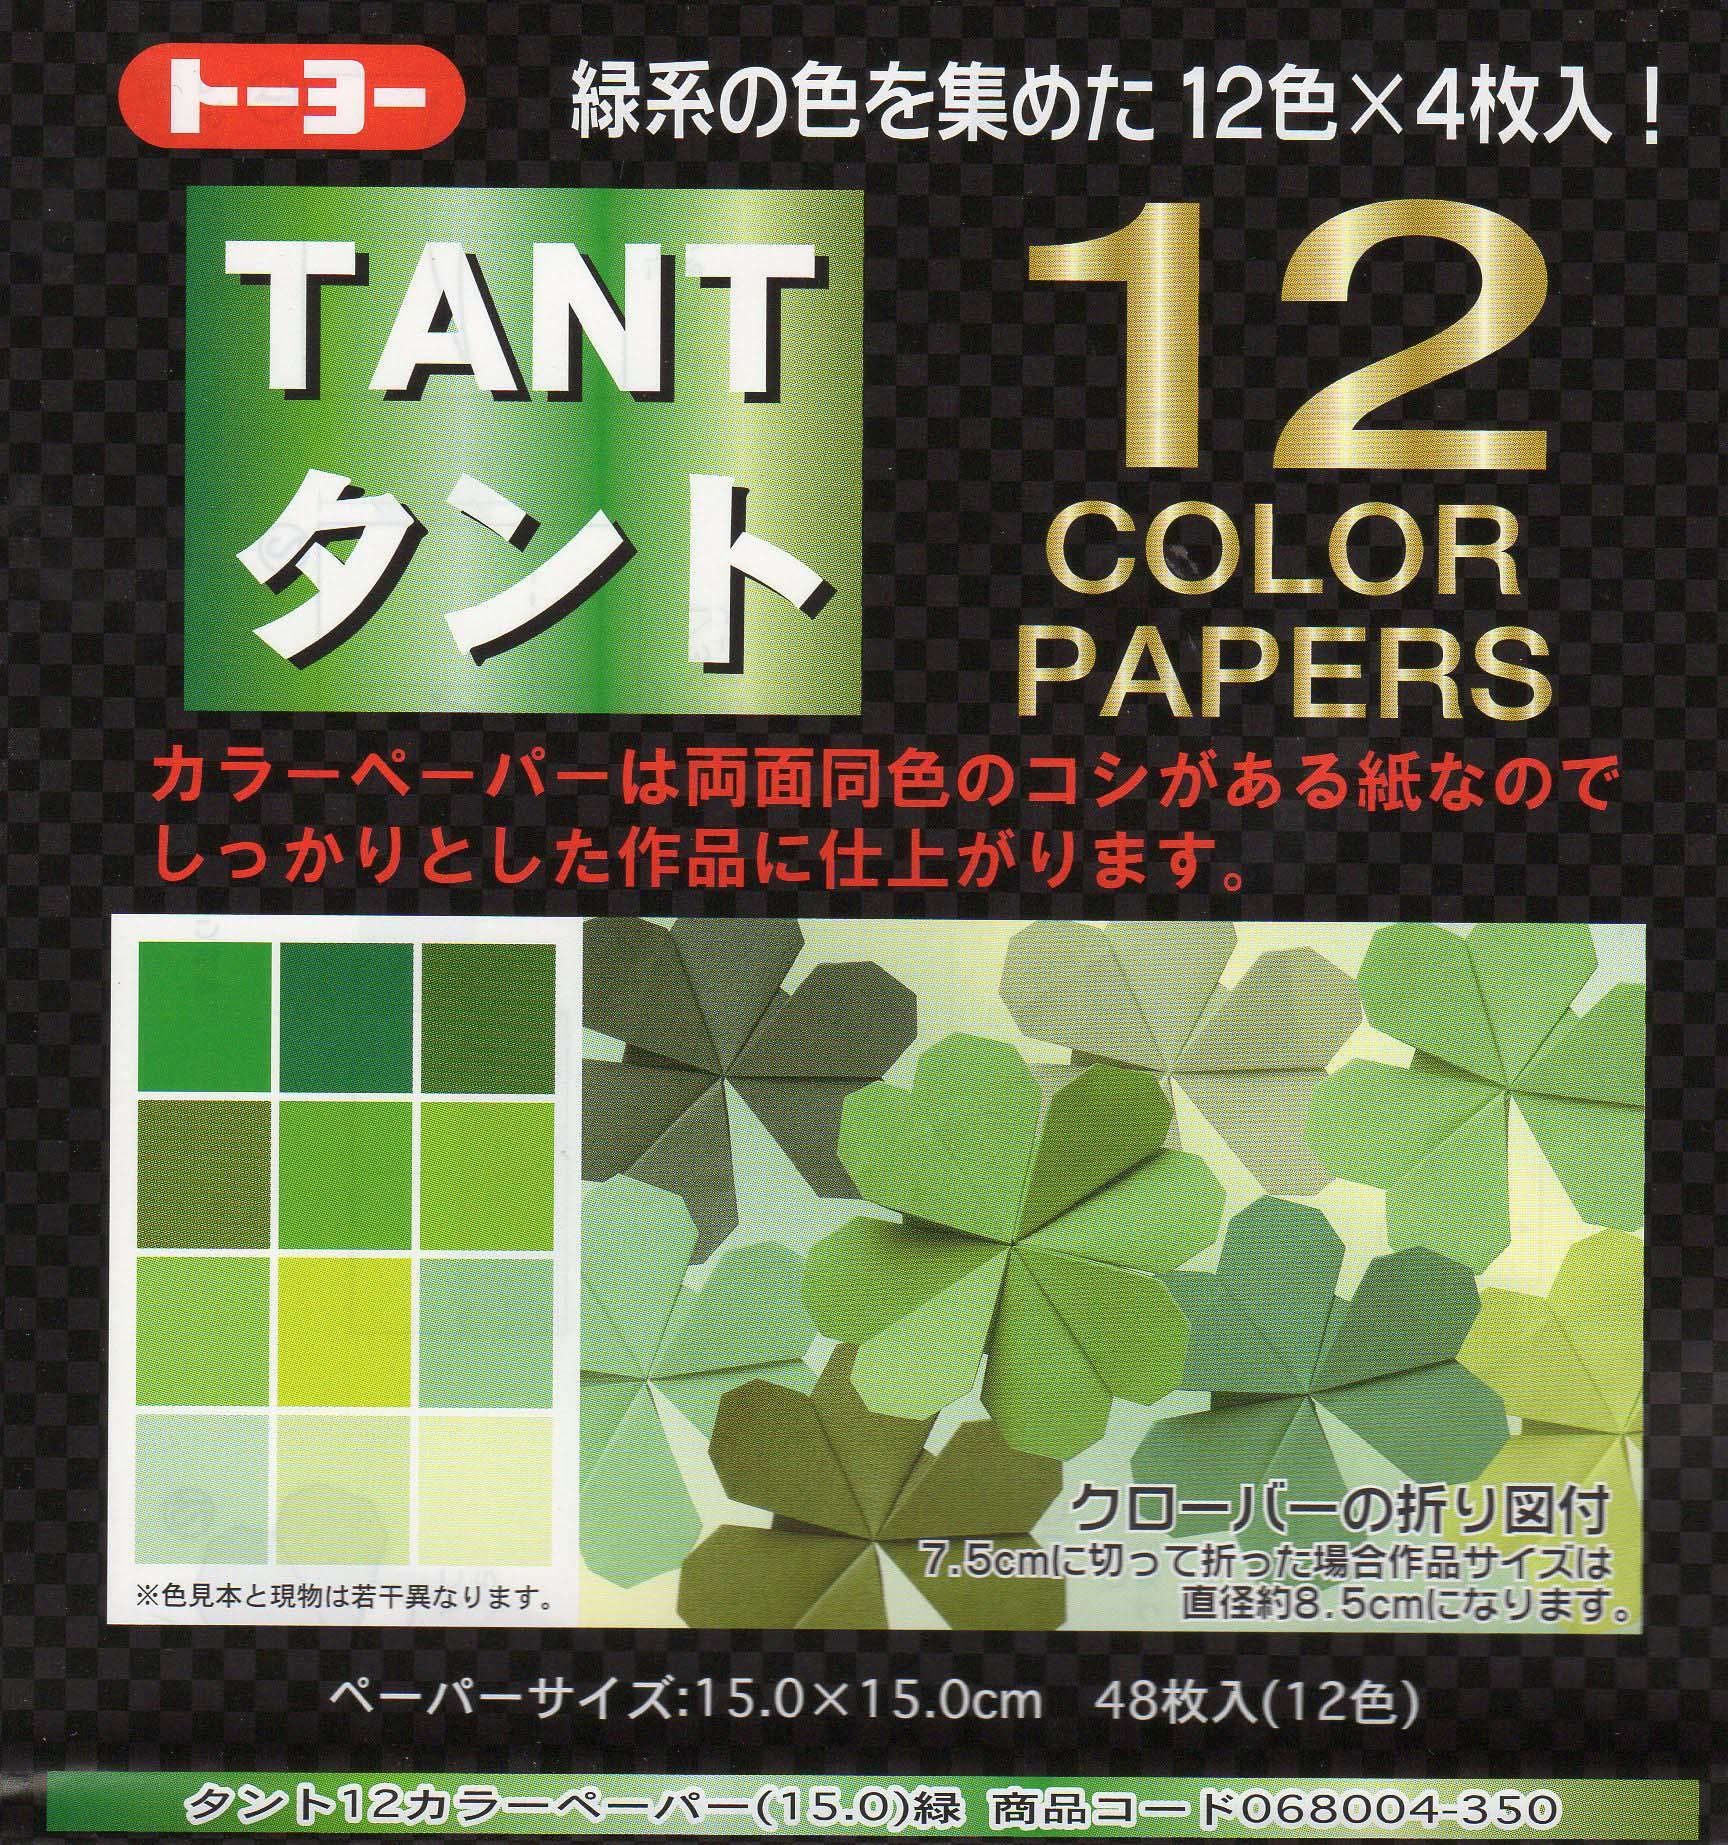 Folded Square — Yellow Origami Paper | Pantone 116 | 1845x1728